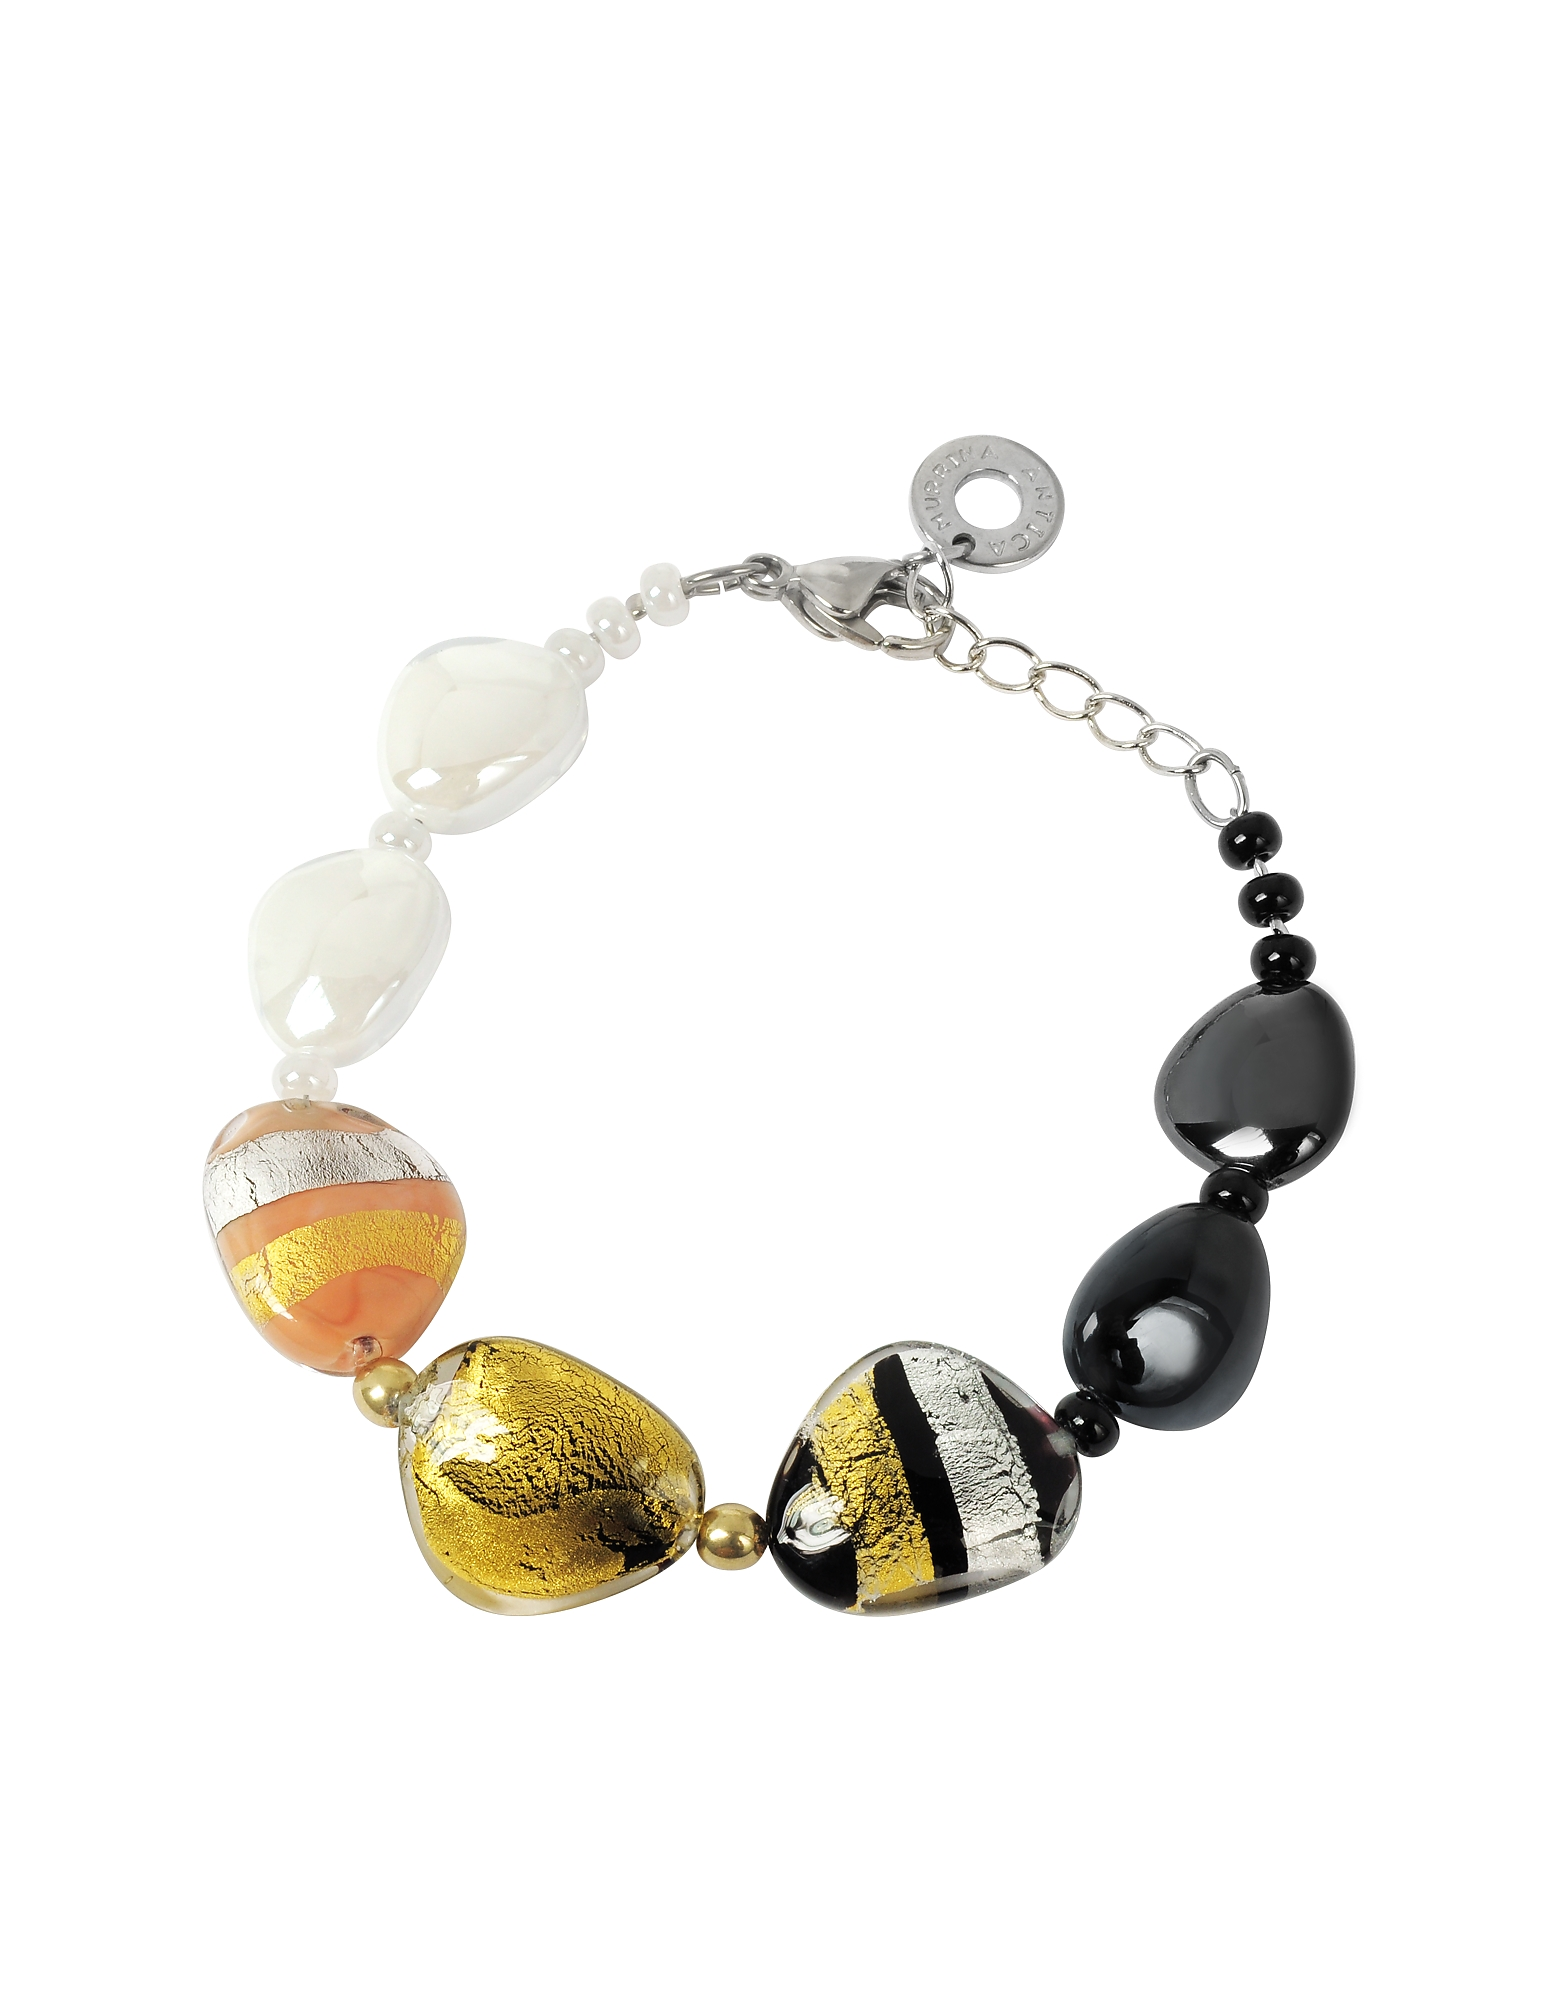 Antica Murrina Bracelets, Moretta Pastel Glass Beads w/24kt Gold and Silver Leaf Bracelet